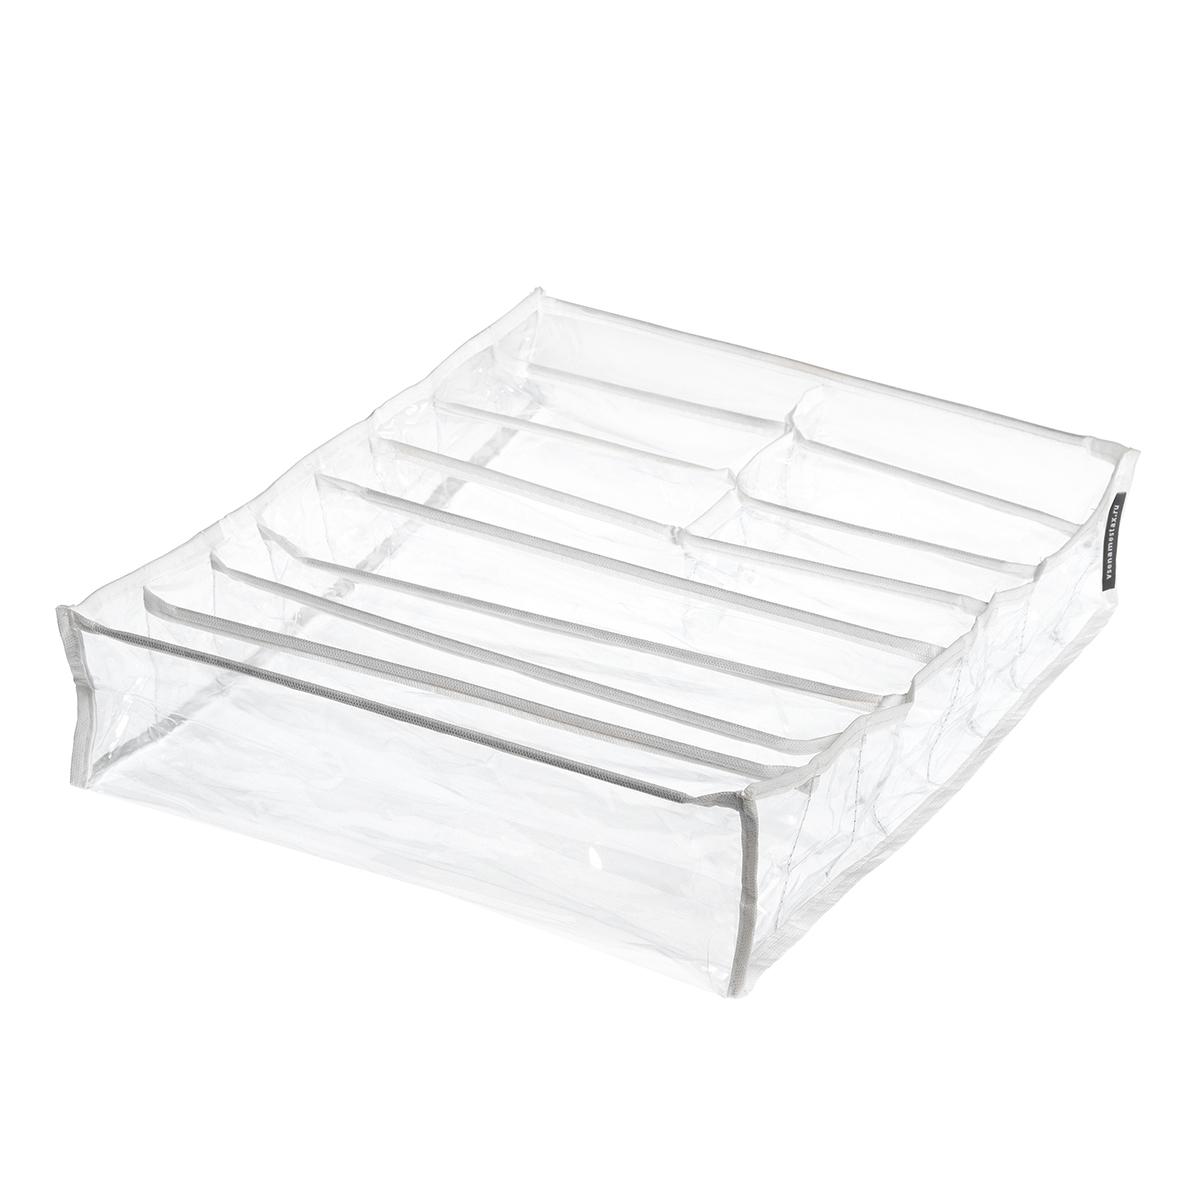 Органайзер прозрачный 40х35х10 см, 11 ячеек, Белый